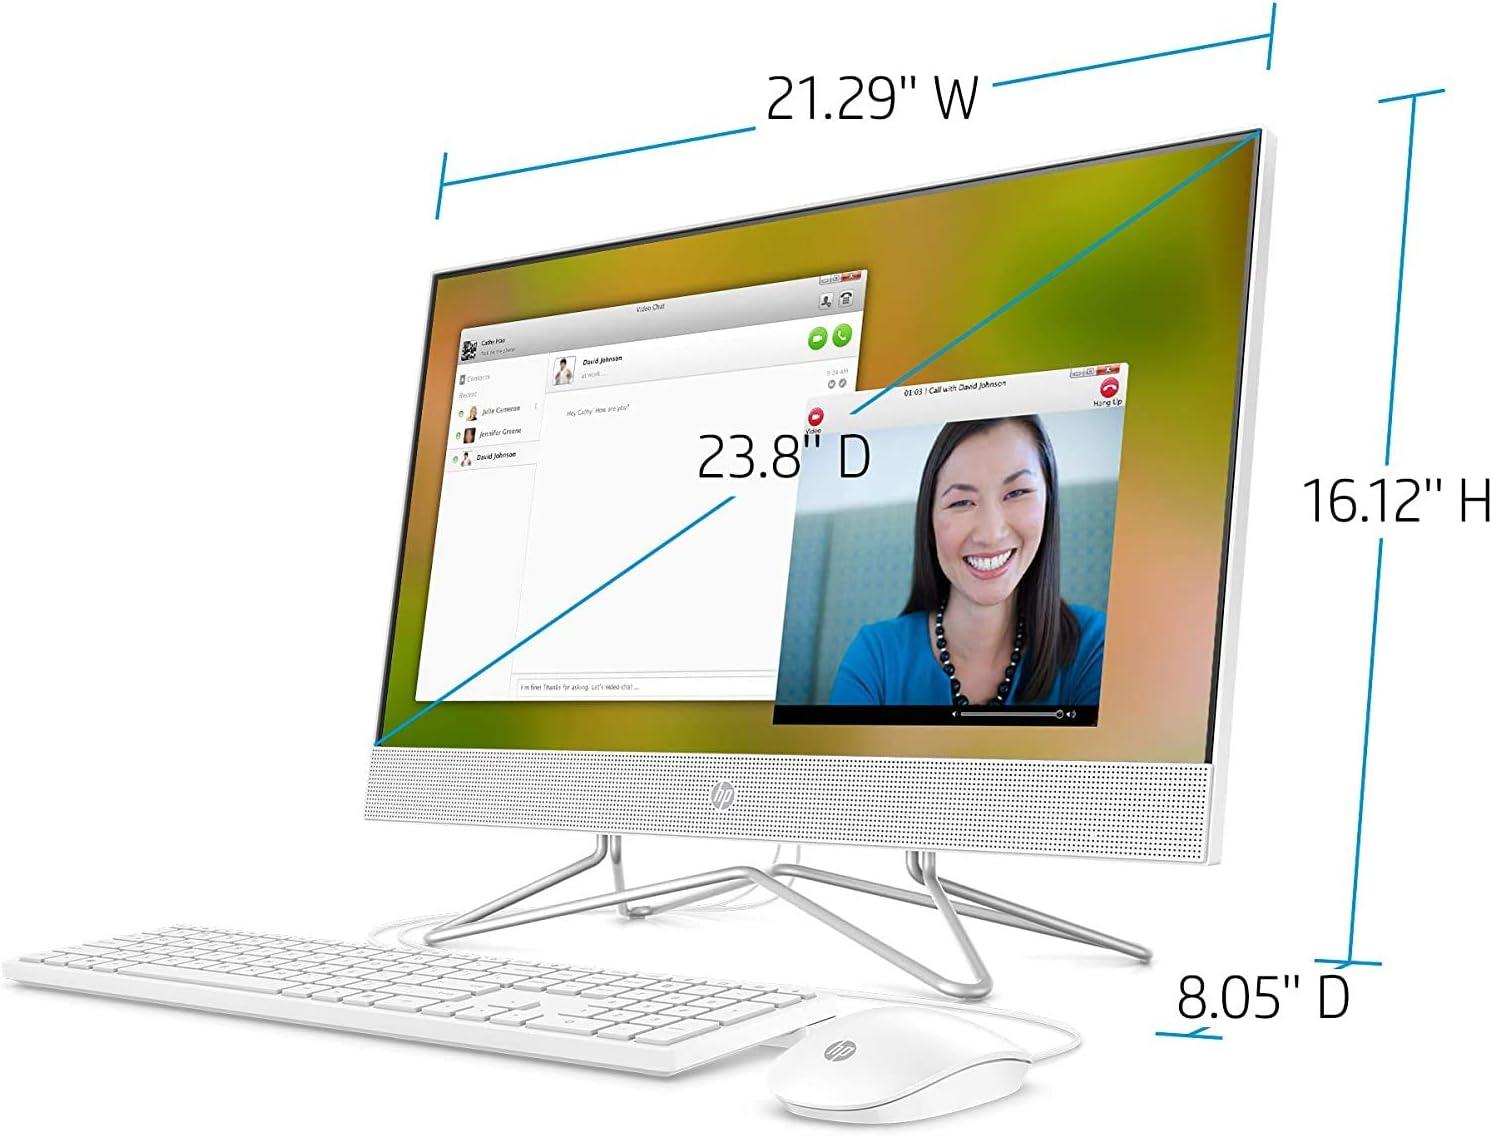 iPuzzle Mousepad 2TB PCIe SSD Remote Work AC WiFi AMD Athlon 3050U Up to 3.2GHz Bluetooth 4.2 Beats i3-7130U 16GB DDR4 RAM DVDRW HP 24 AIO 23.8 FHD All in One Desktop Computer Windows 10